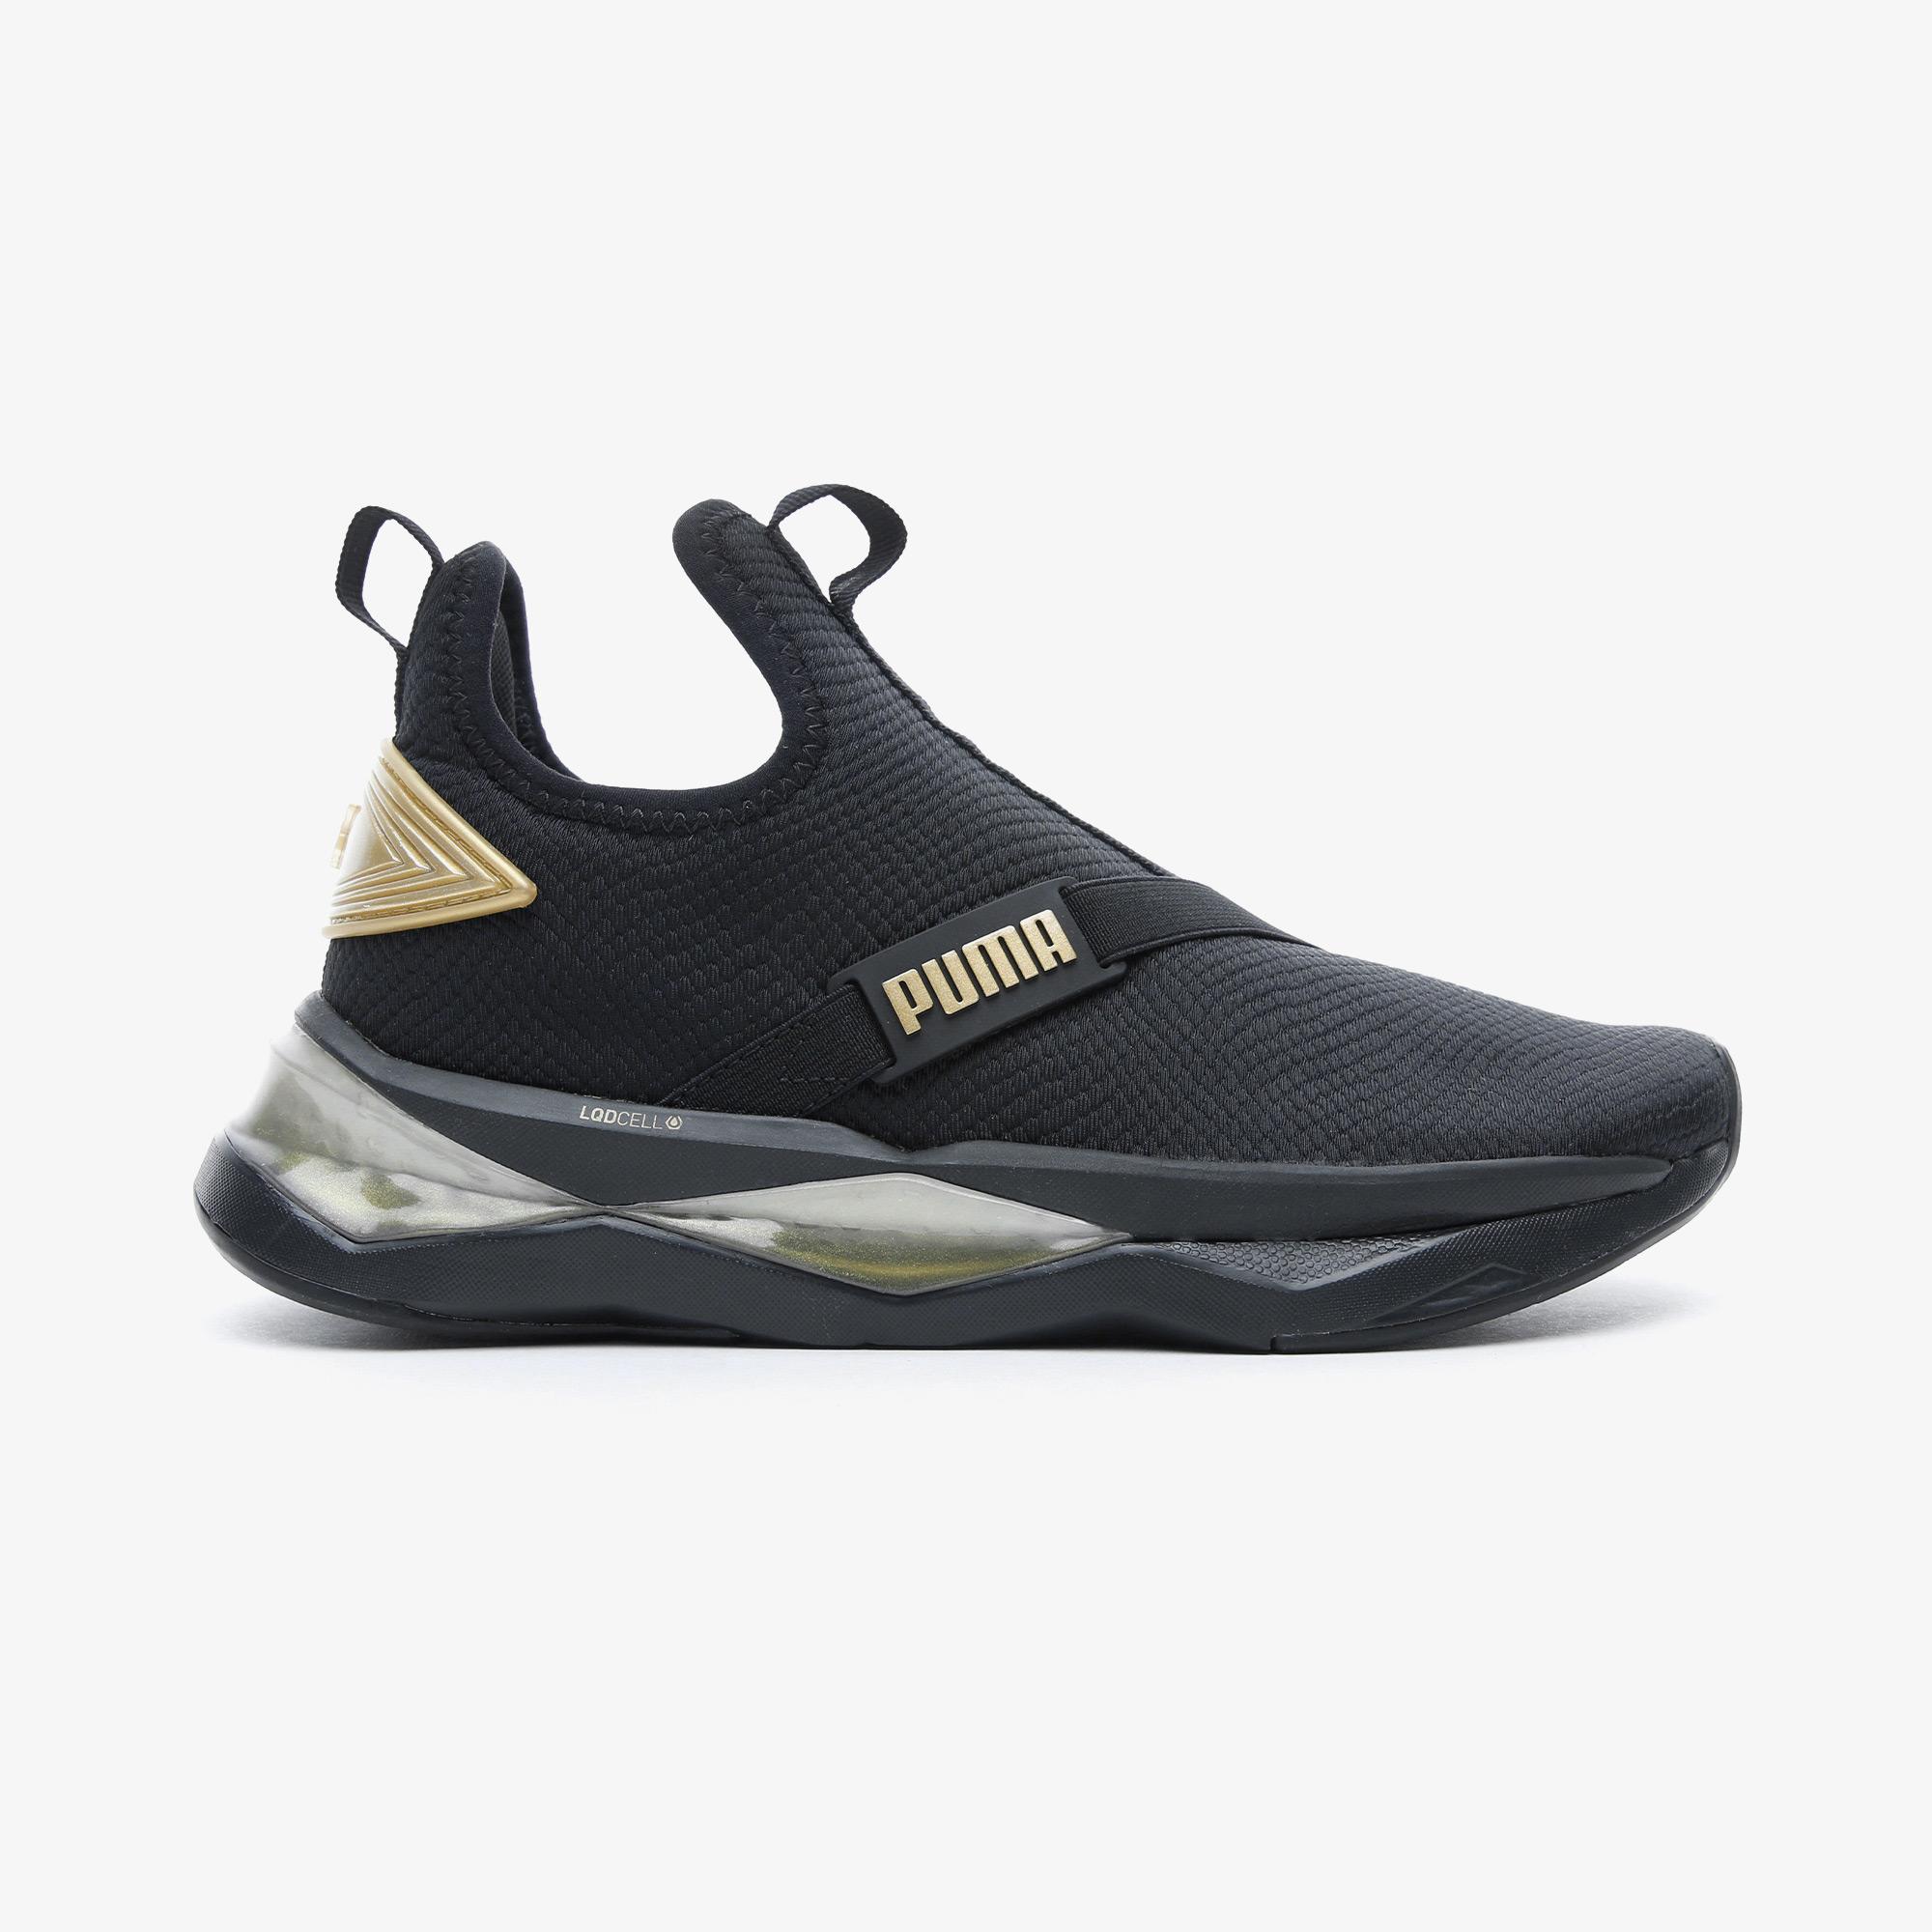 Puma LQDCELL Shatter Mid Kadın Siyah Spor Ayakkabı